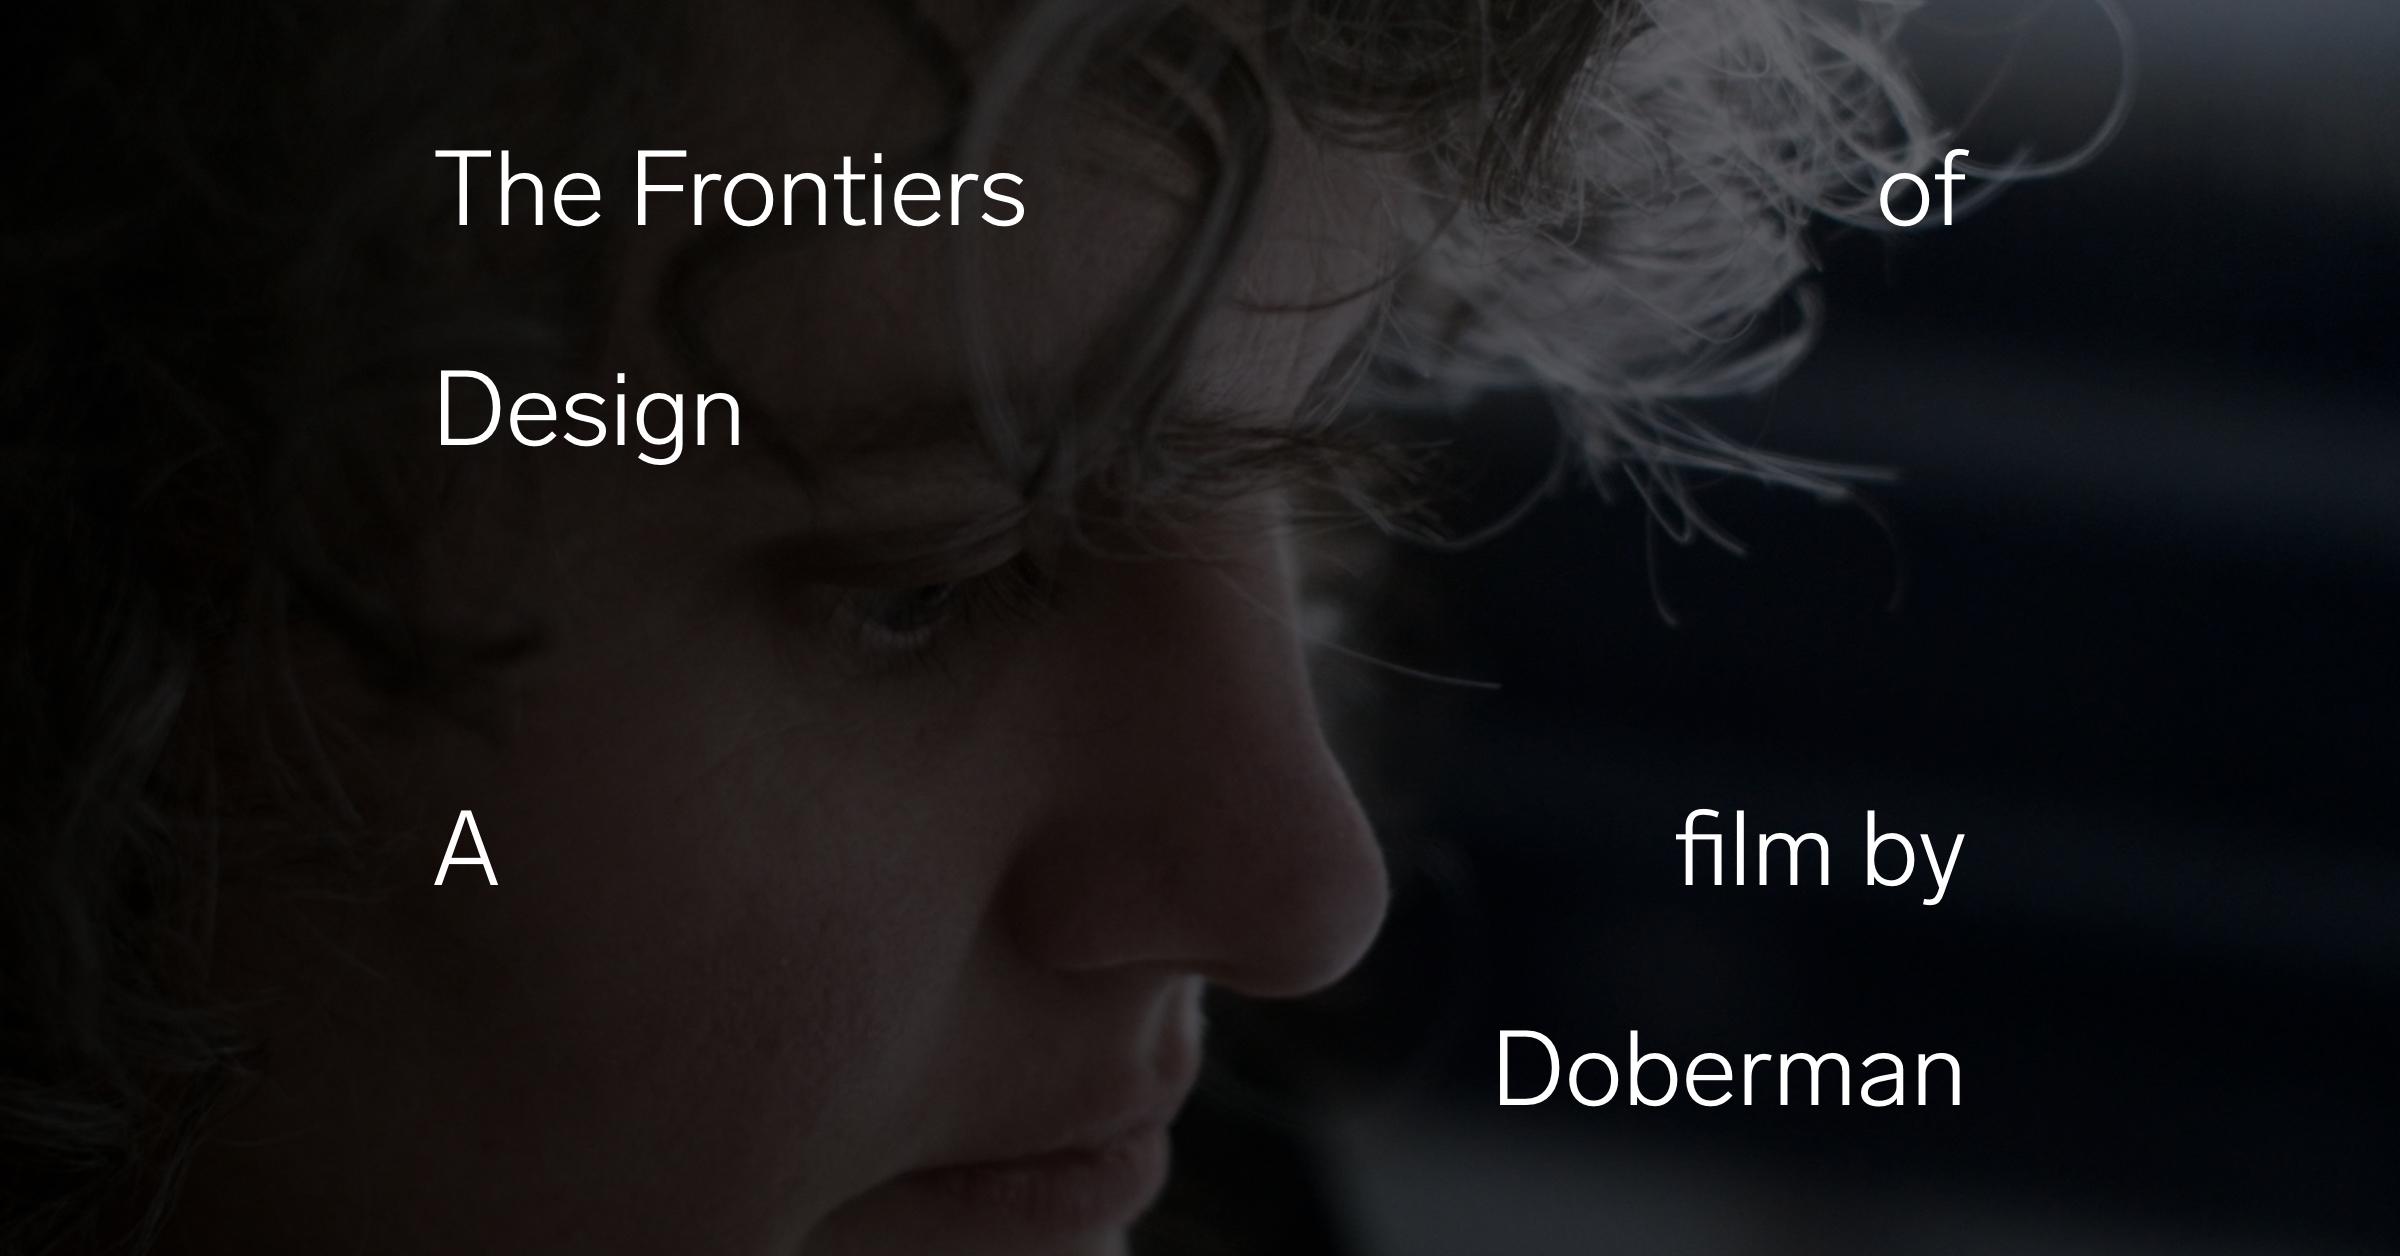 Thefrontiersofdesign